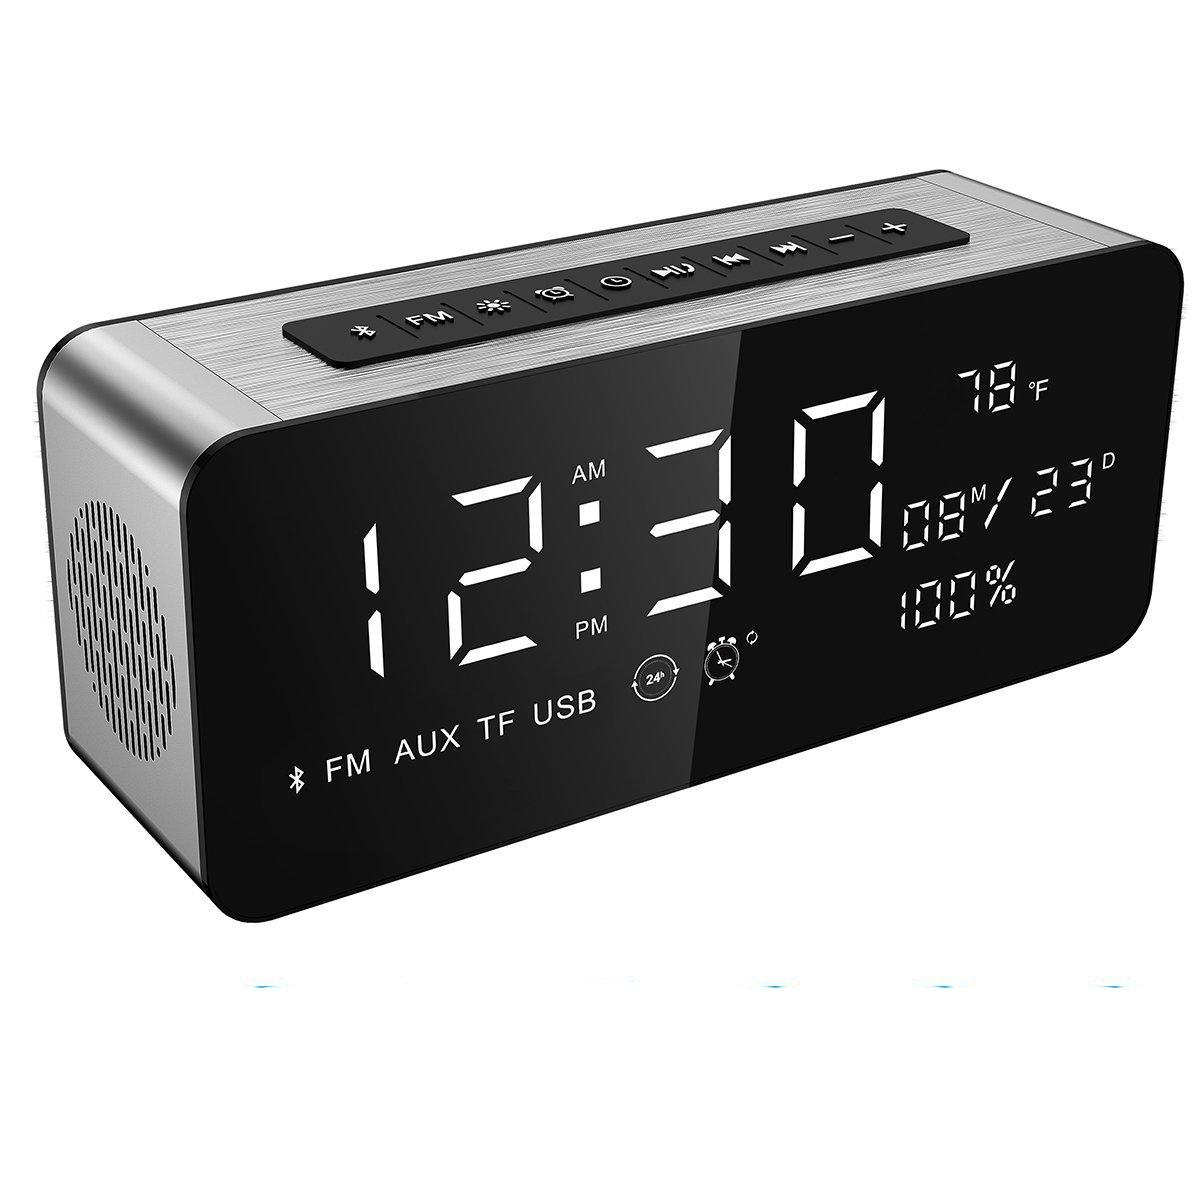 Soundance Electric Digital LED Alarm Clock Wireless FM Radio Portable Speaker with USB Built-in Microphone for Bedroom Bedside Office Desk PC Laptop Desktop Computer, A10 Silver